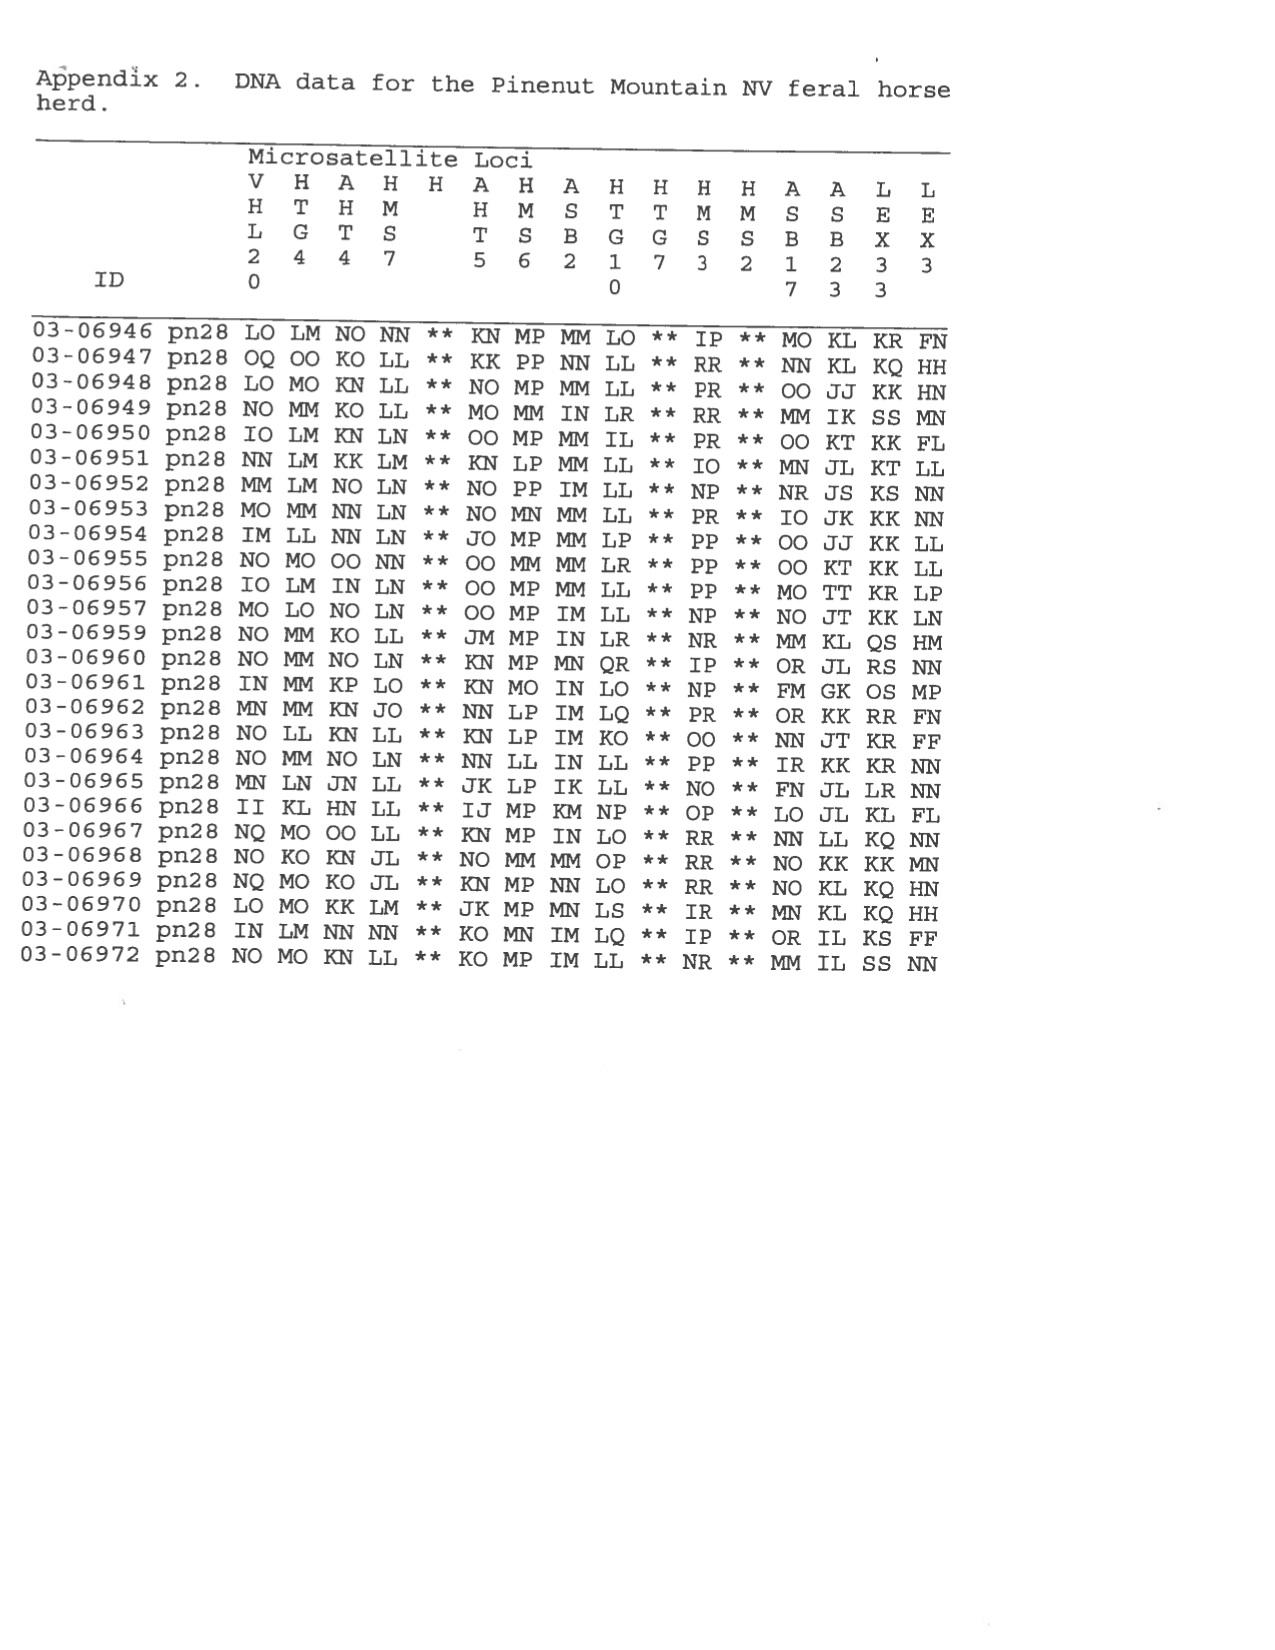 PM Pine Nut genetic Viability P14 Oct 2009